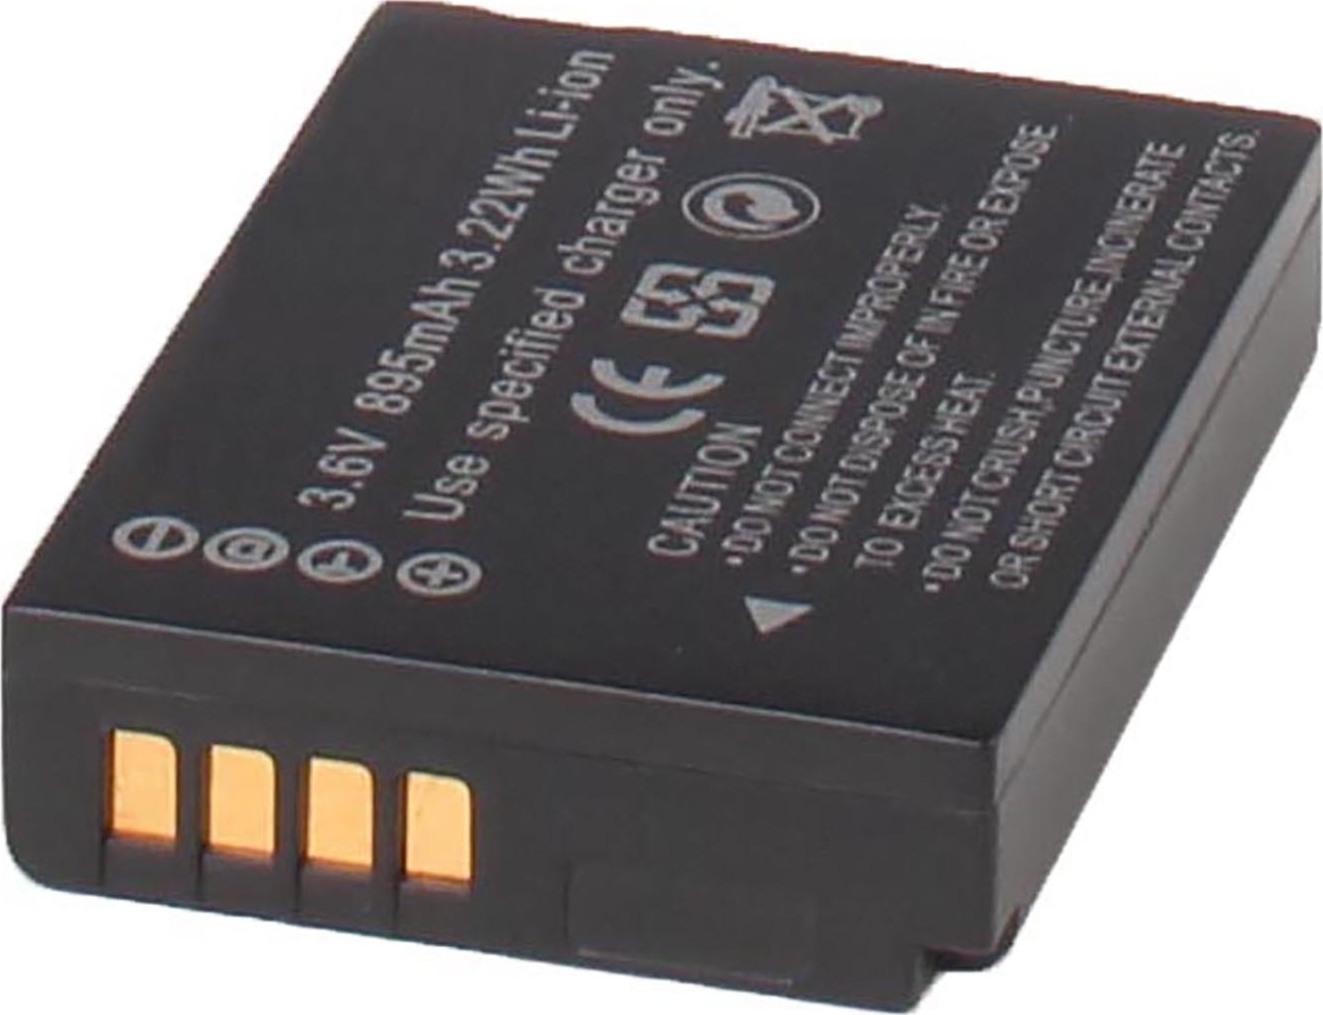 Аккумуляторная батарея iBatt iB-T1-F319 890mAh для камер Leica V-Lux 30, V-Lux 40, V-Lux 20,  для Panasonic Lumix DMC-TZ20, Lumix DMC-TZ8, Lumix DMC-TZ10, Lumix DMC-TZ30, Lumix DMC-TZ18, Lumix DMC-TZ7, Lumix DMC-TZ25, Lumix DMC-TZ6, Lumix DMC-ZX3,